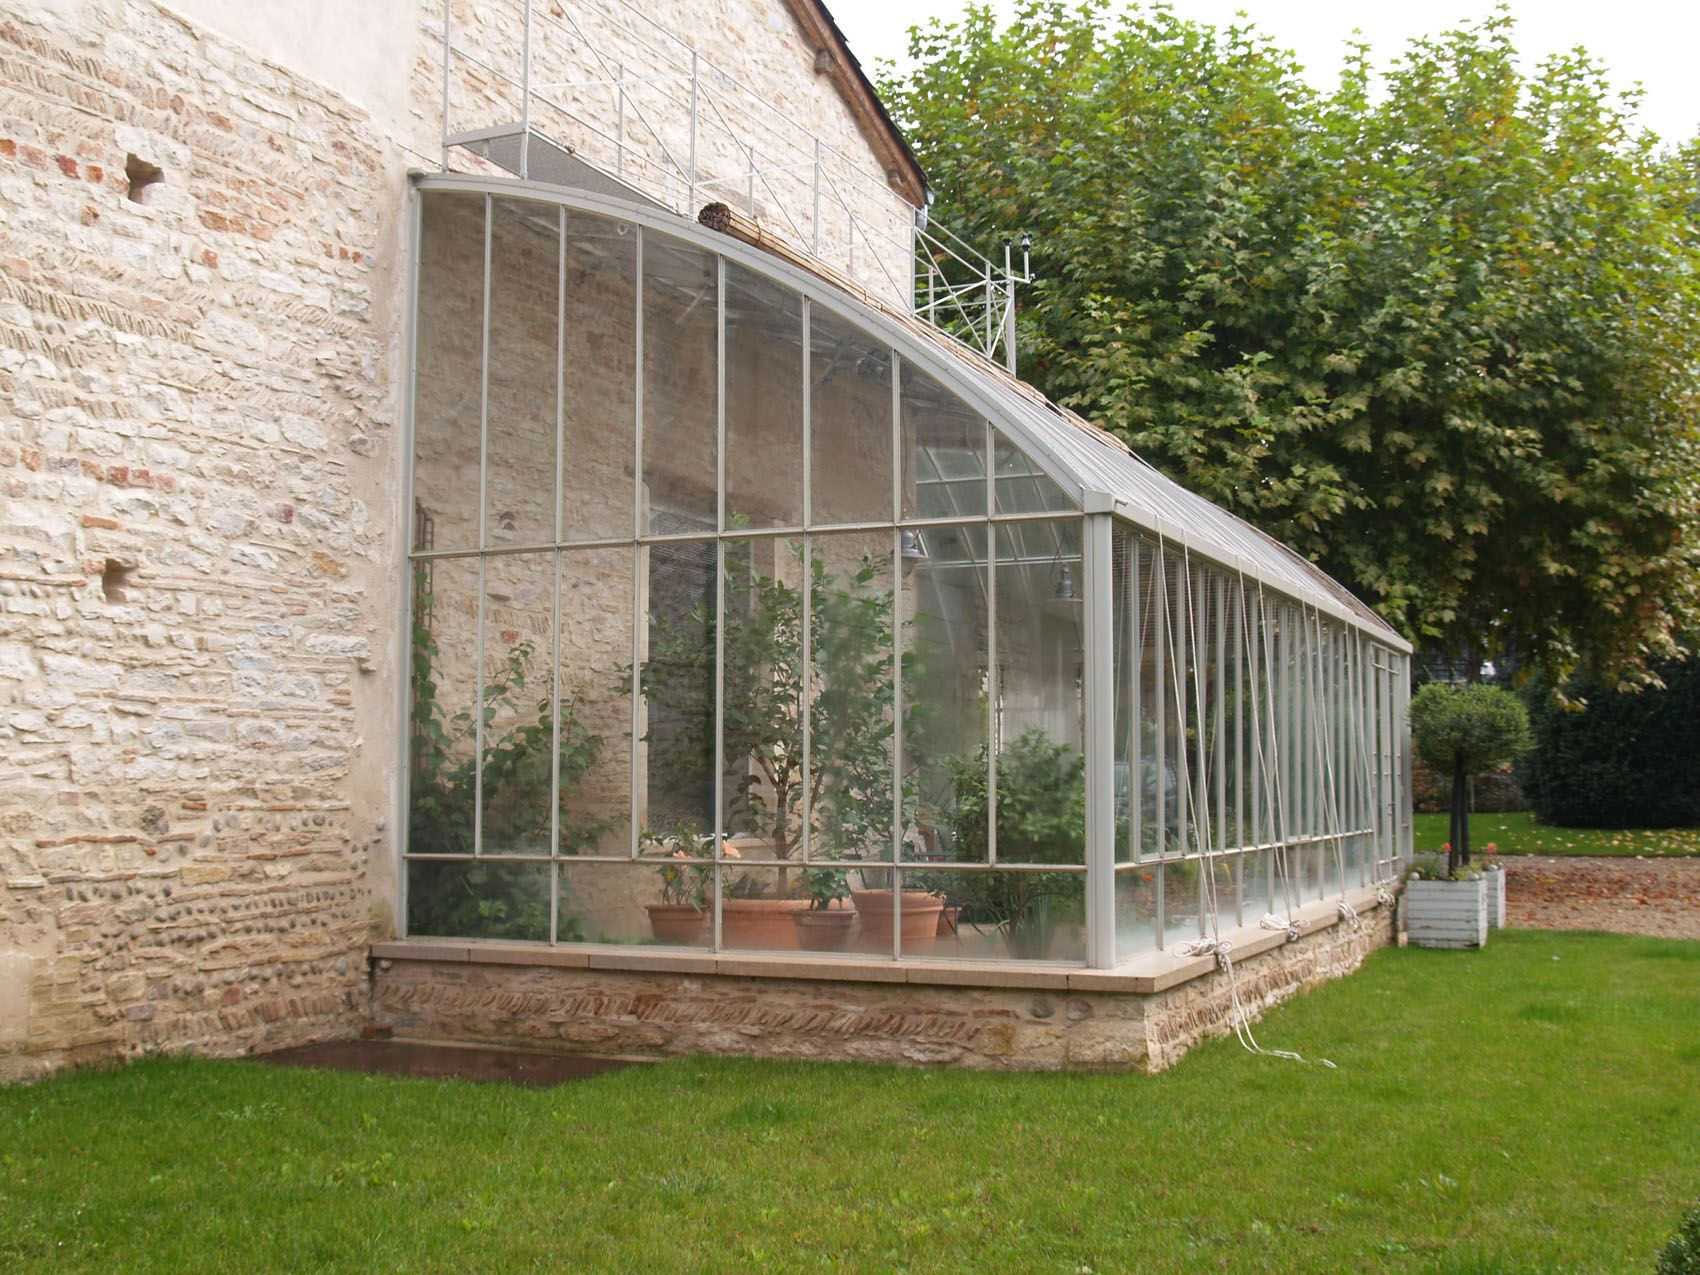 Best 25 Serre Adossã E Ideas On Pinterest Cabane Jardin La ... tout Serre De Jardin Occasion A Vendre